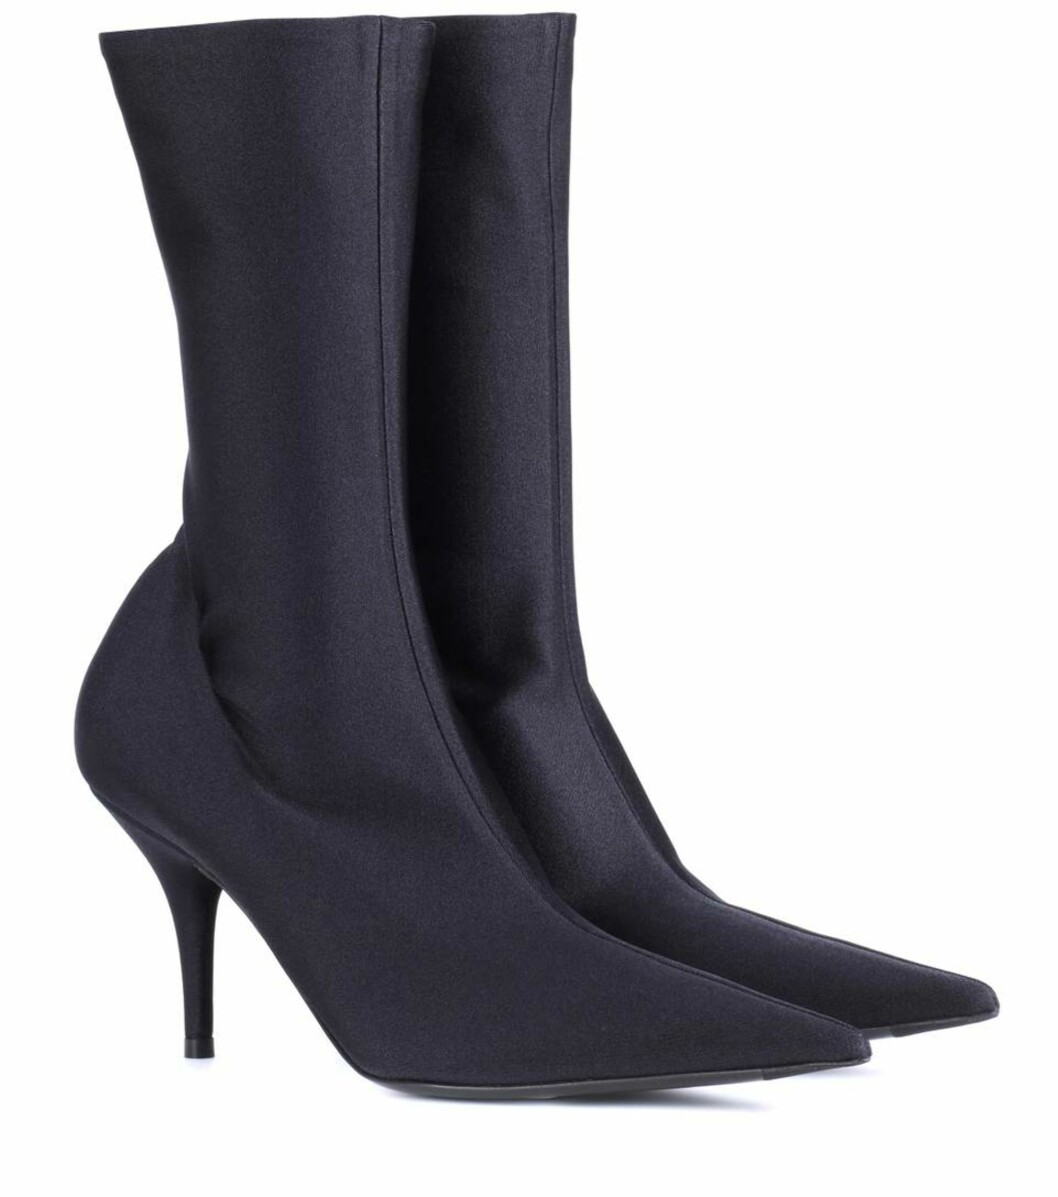 Sko fra Balenciaga via Mytheresa.com |8750,-| https://www.mytheresa.com/en-de/balenciaga-knife-stretch-jersey-ankle-boots-900767.html?catref=category